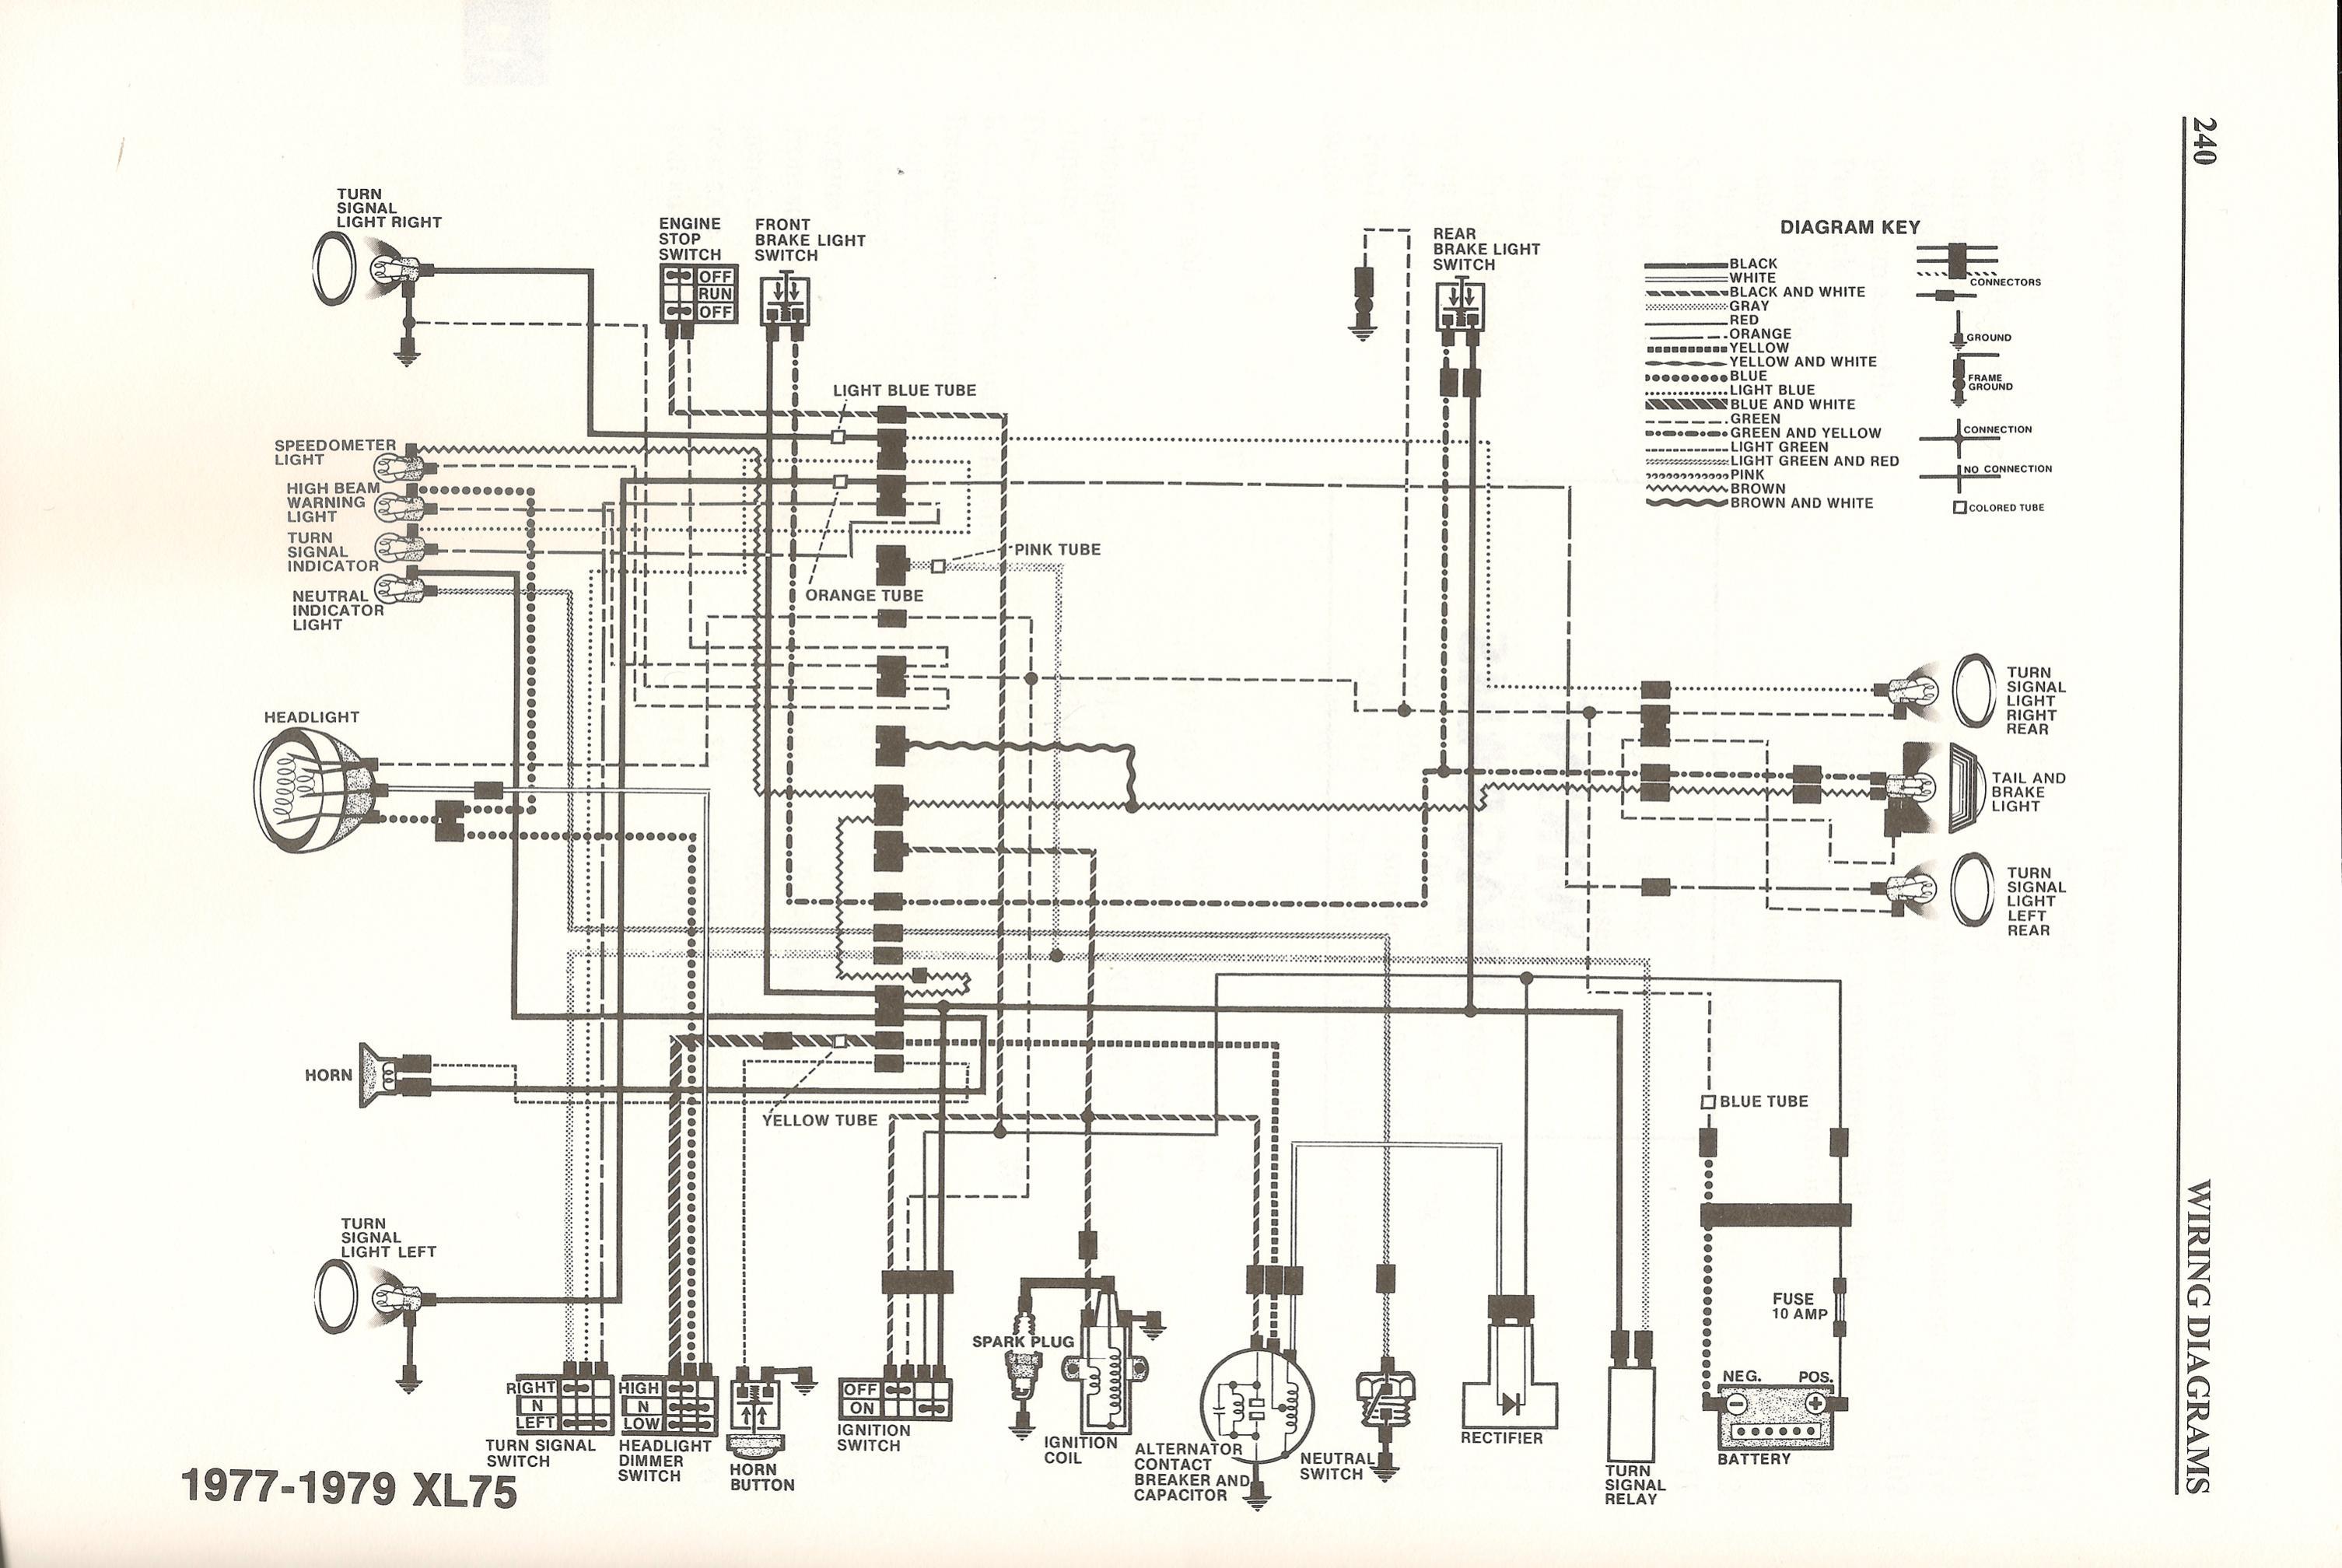 1977 honda xl75 stator | page 2 | planetminis forums  planetminis